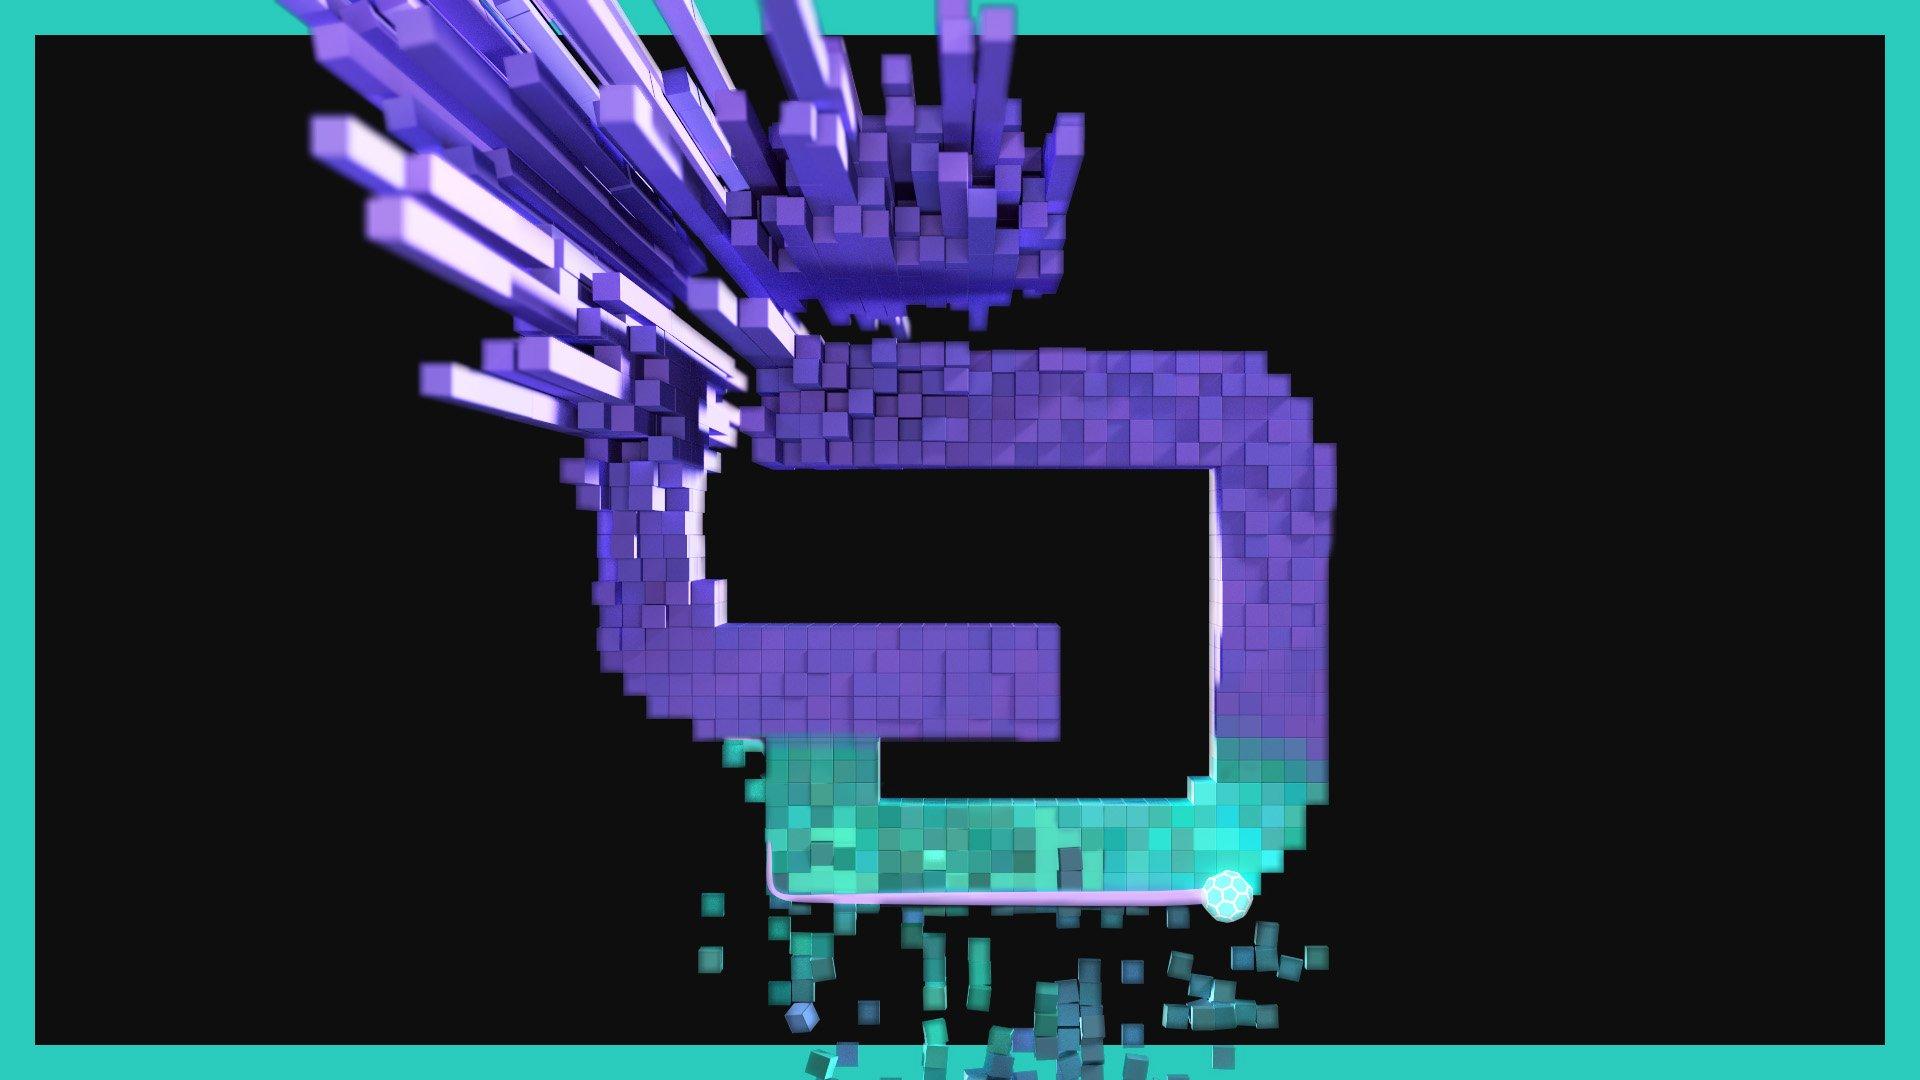 Advanced 3D Logo Animation in Autodesk Maya